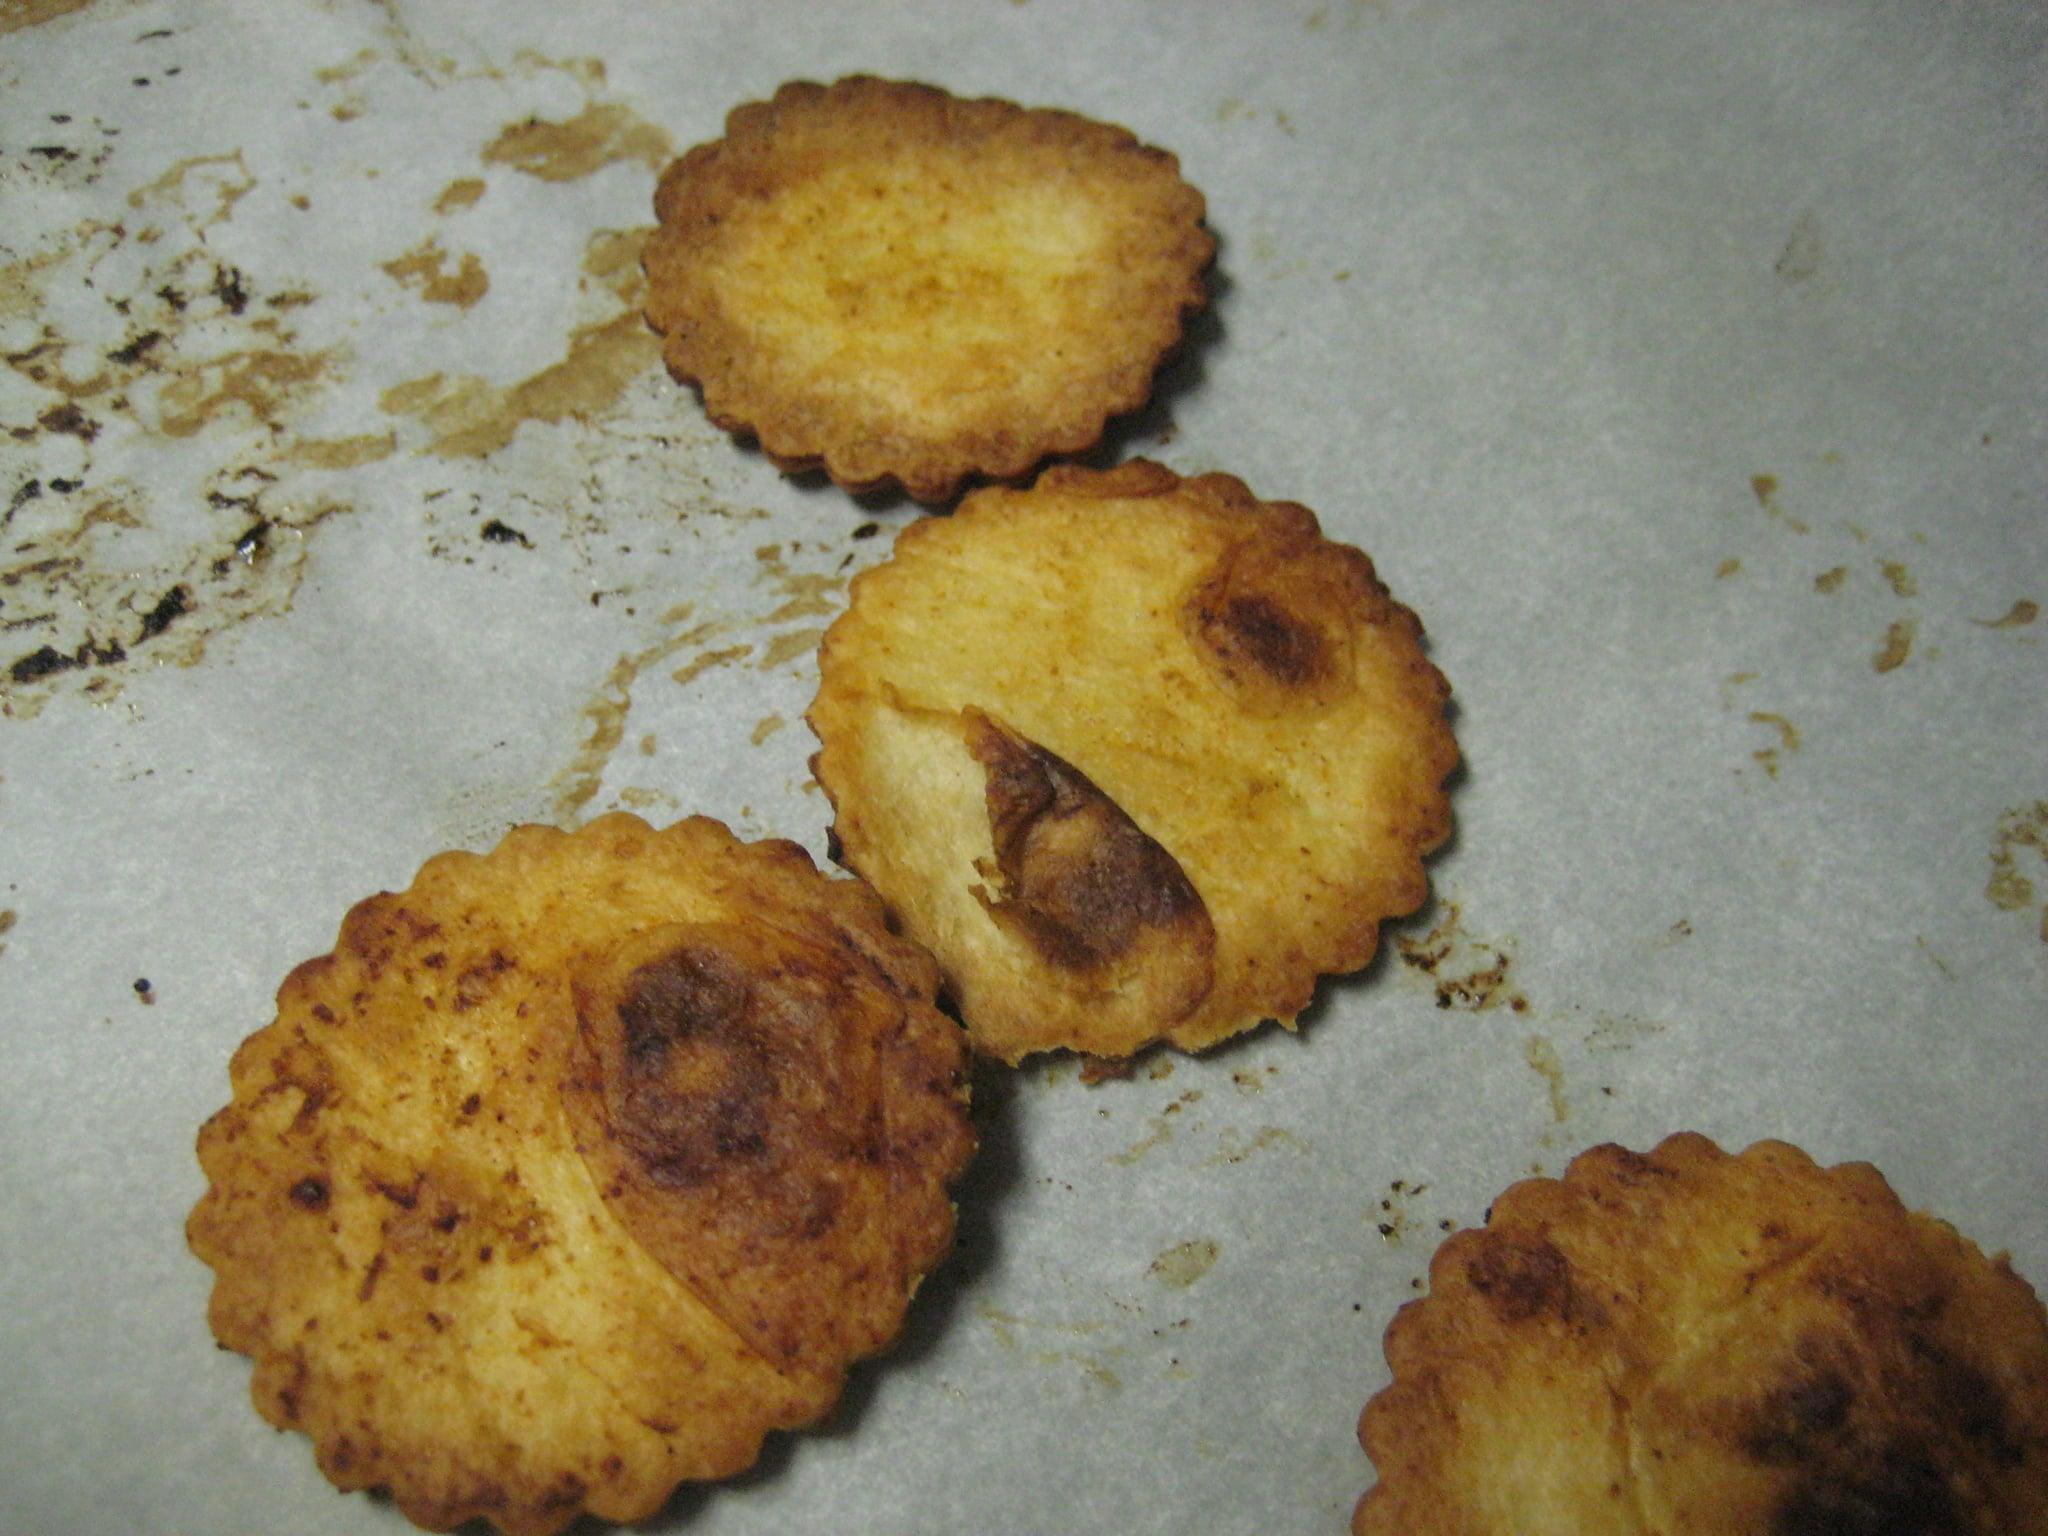 Crispy adobo chips.